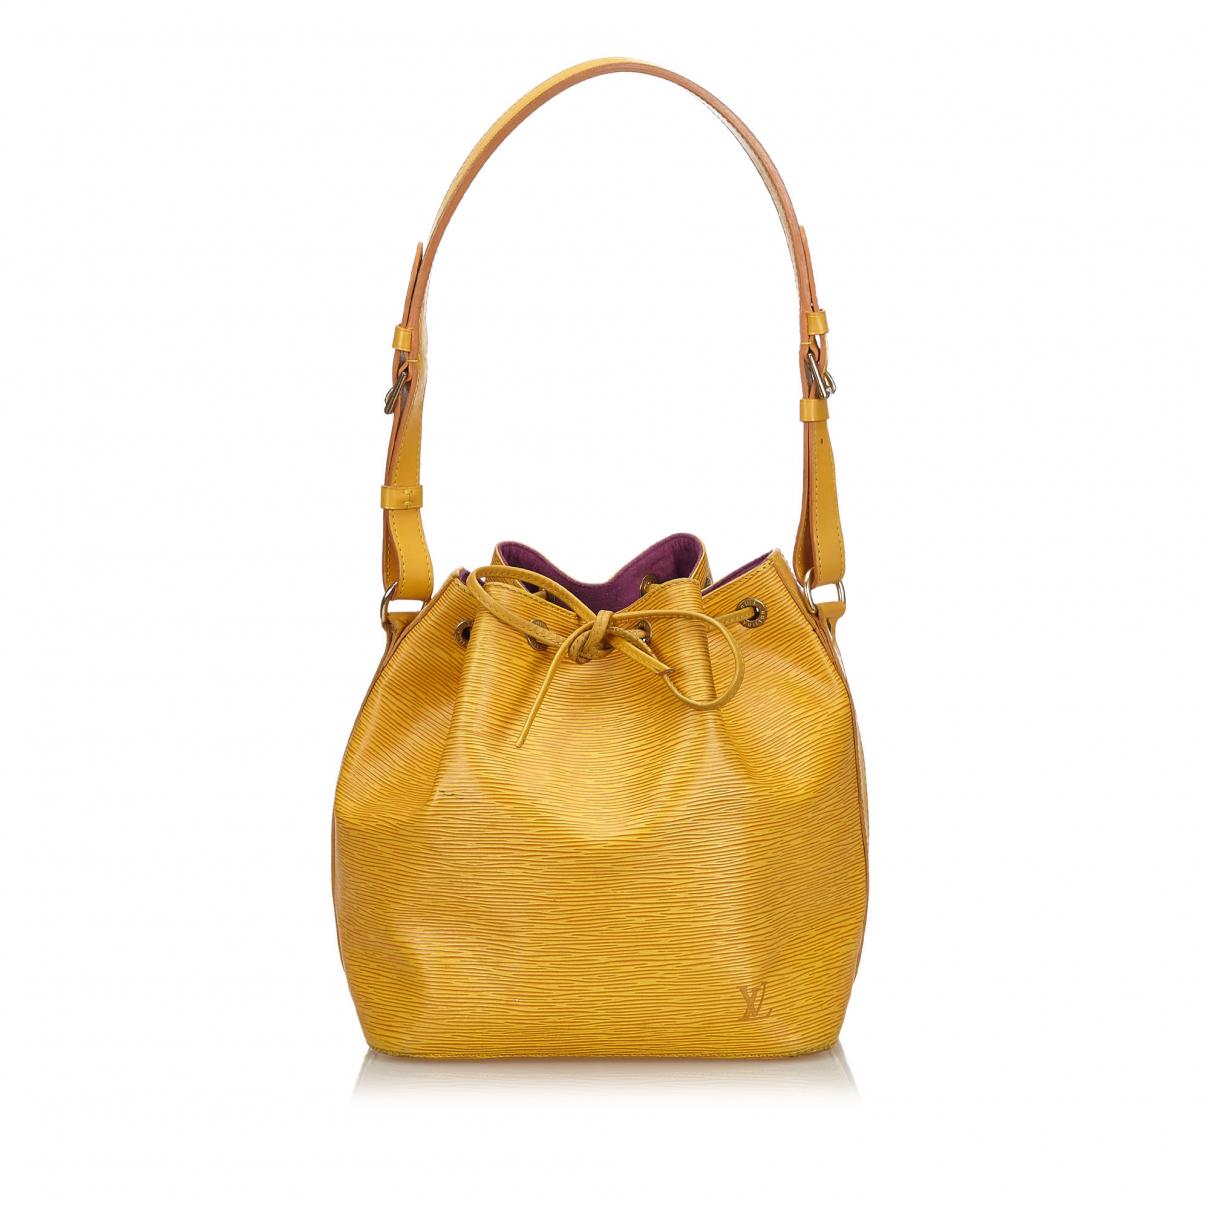 Louis Vuitton N Yellow Leather handbag for Women N